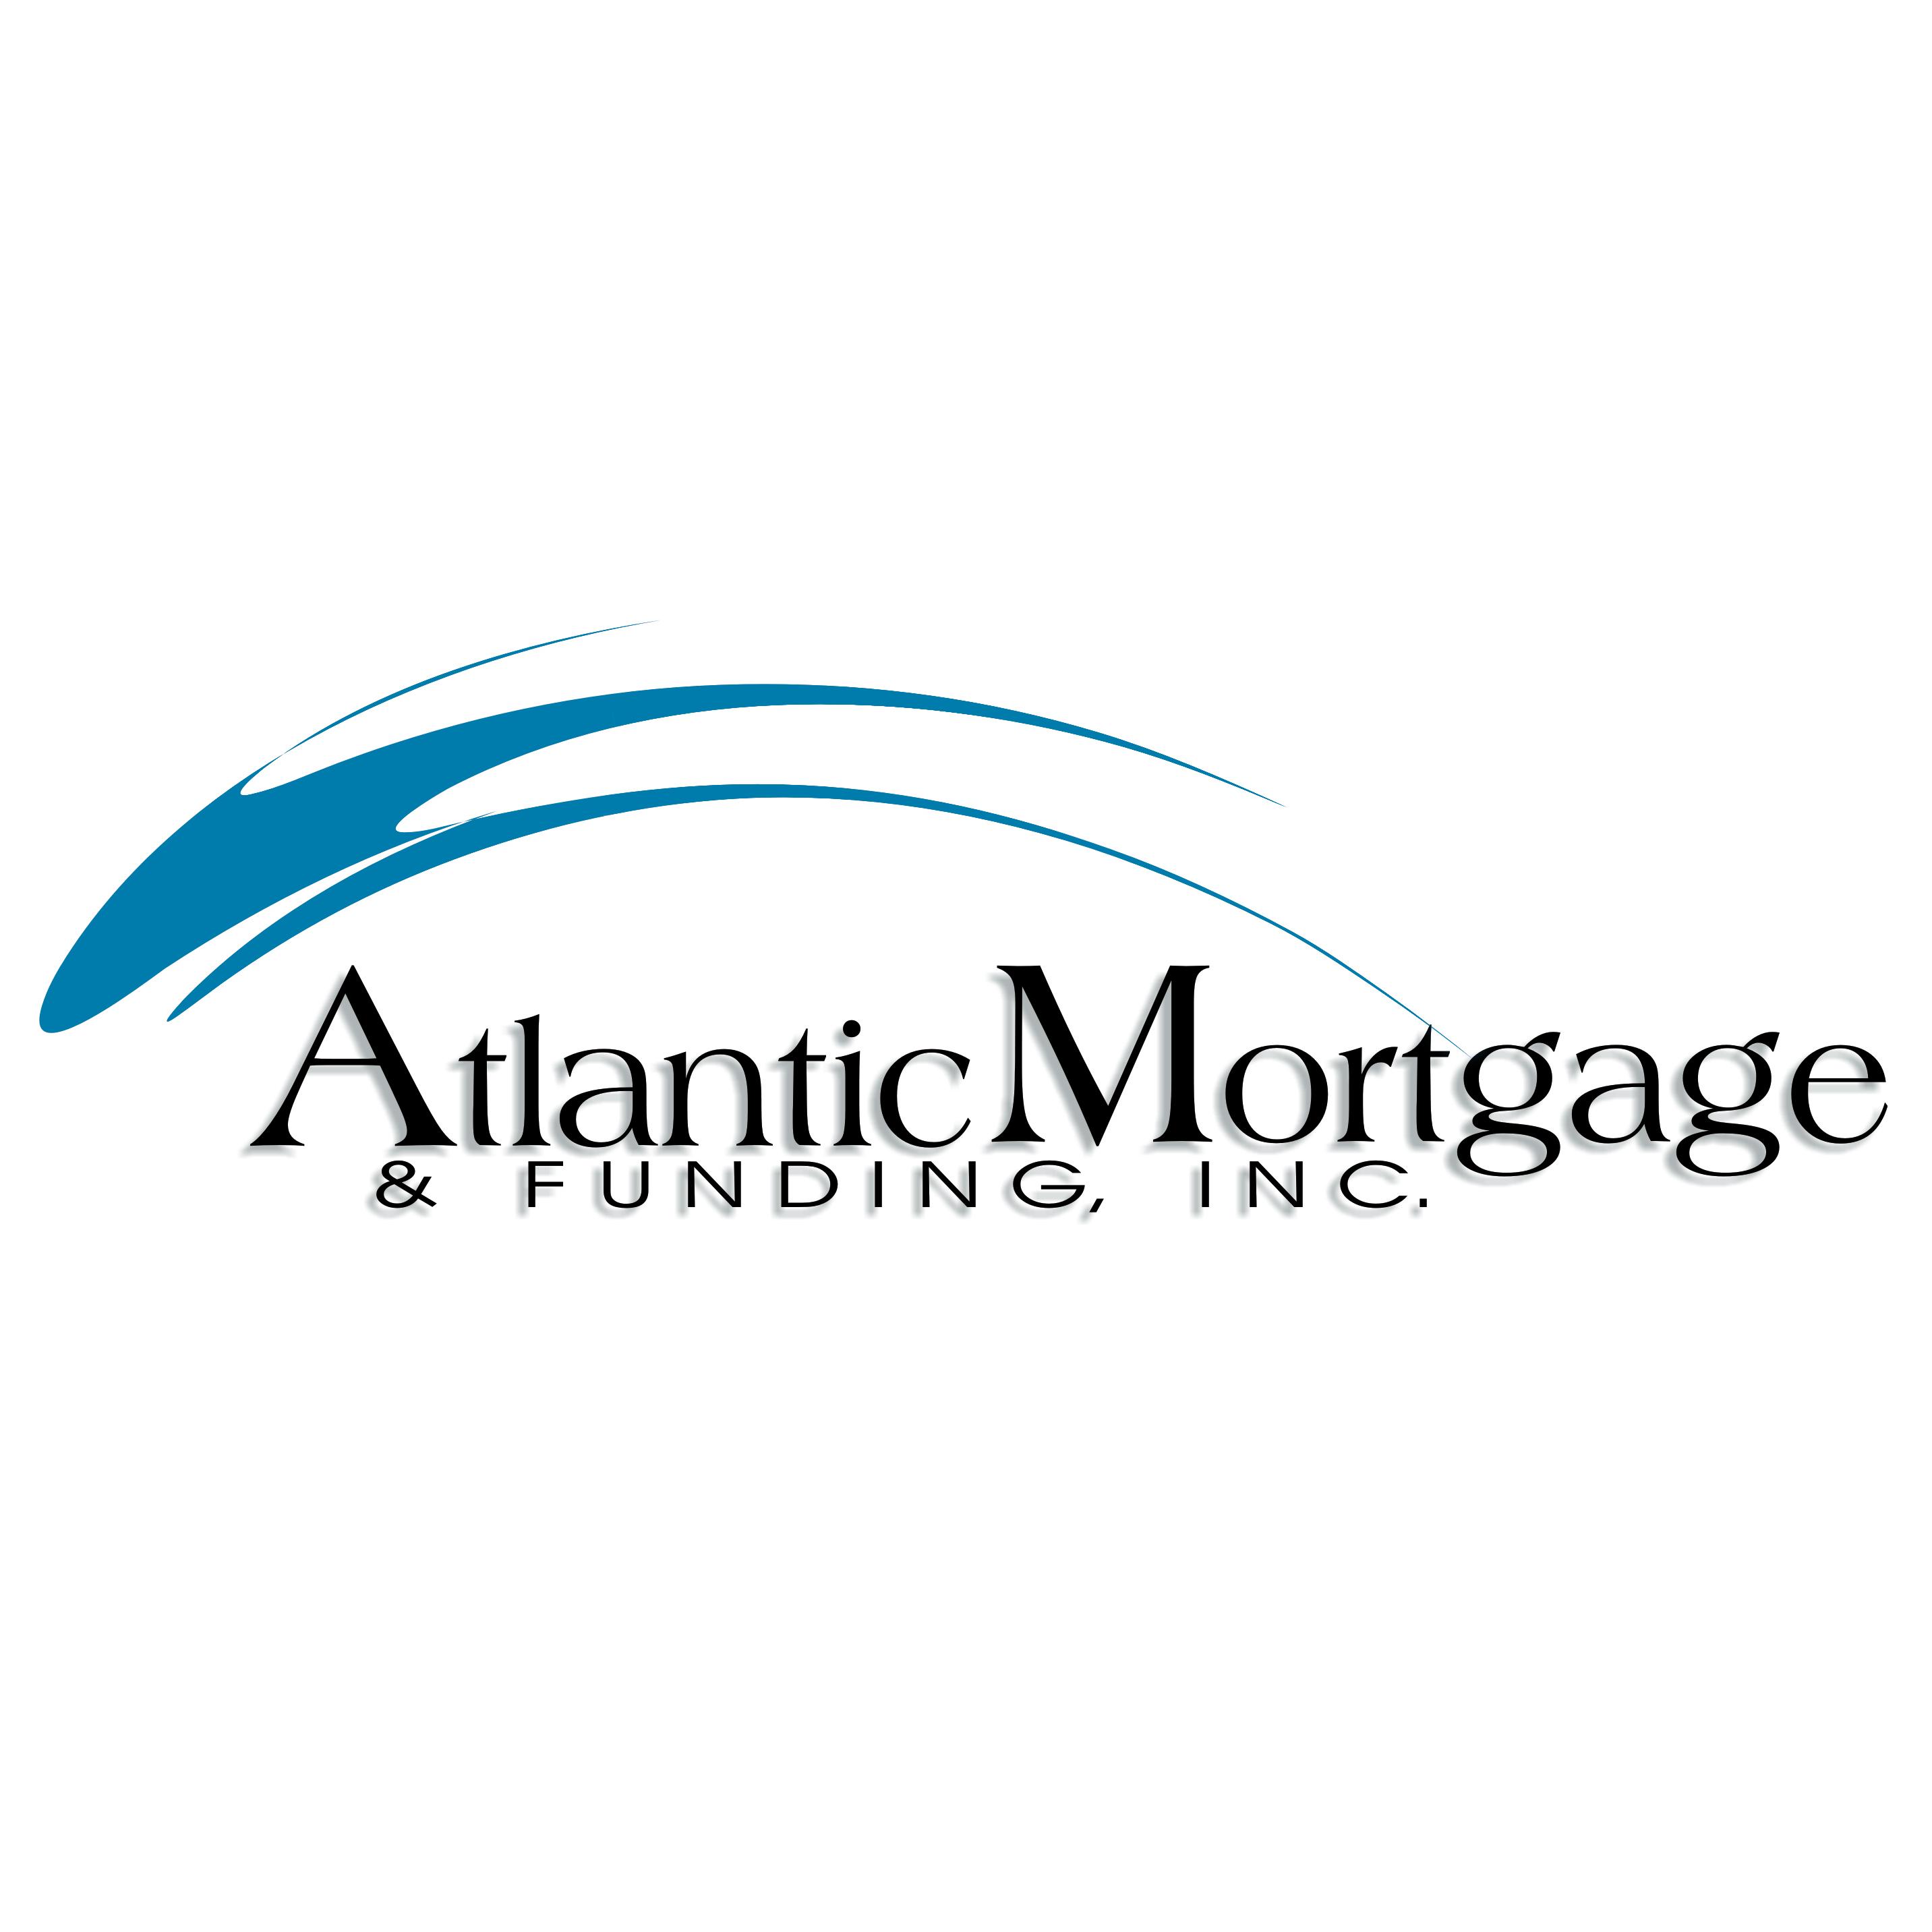 Atlantic Mortgage & Funding, Inc.